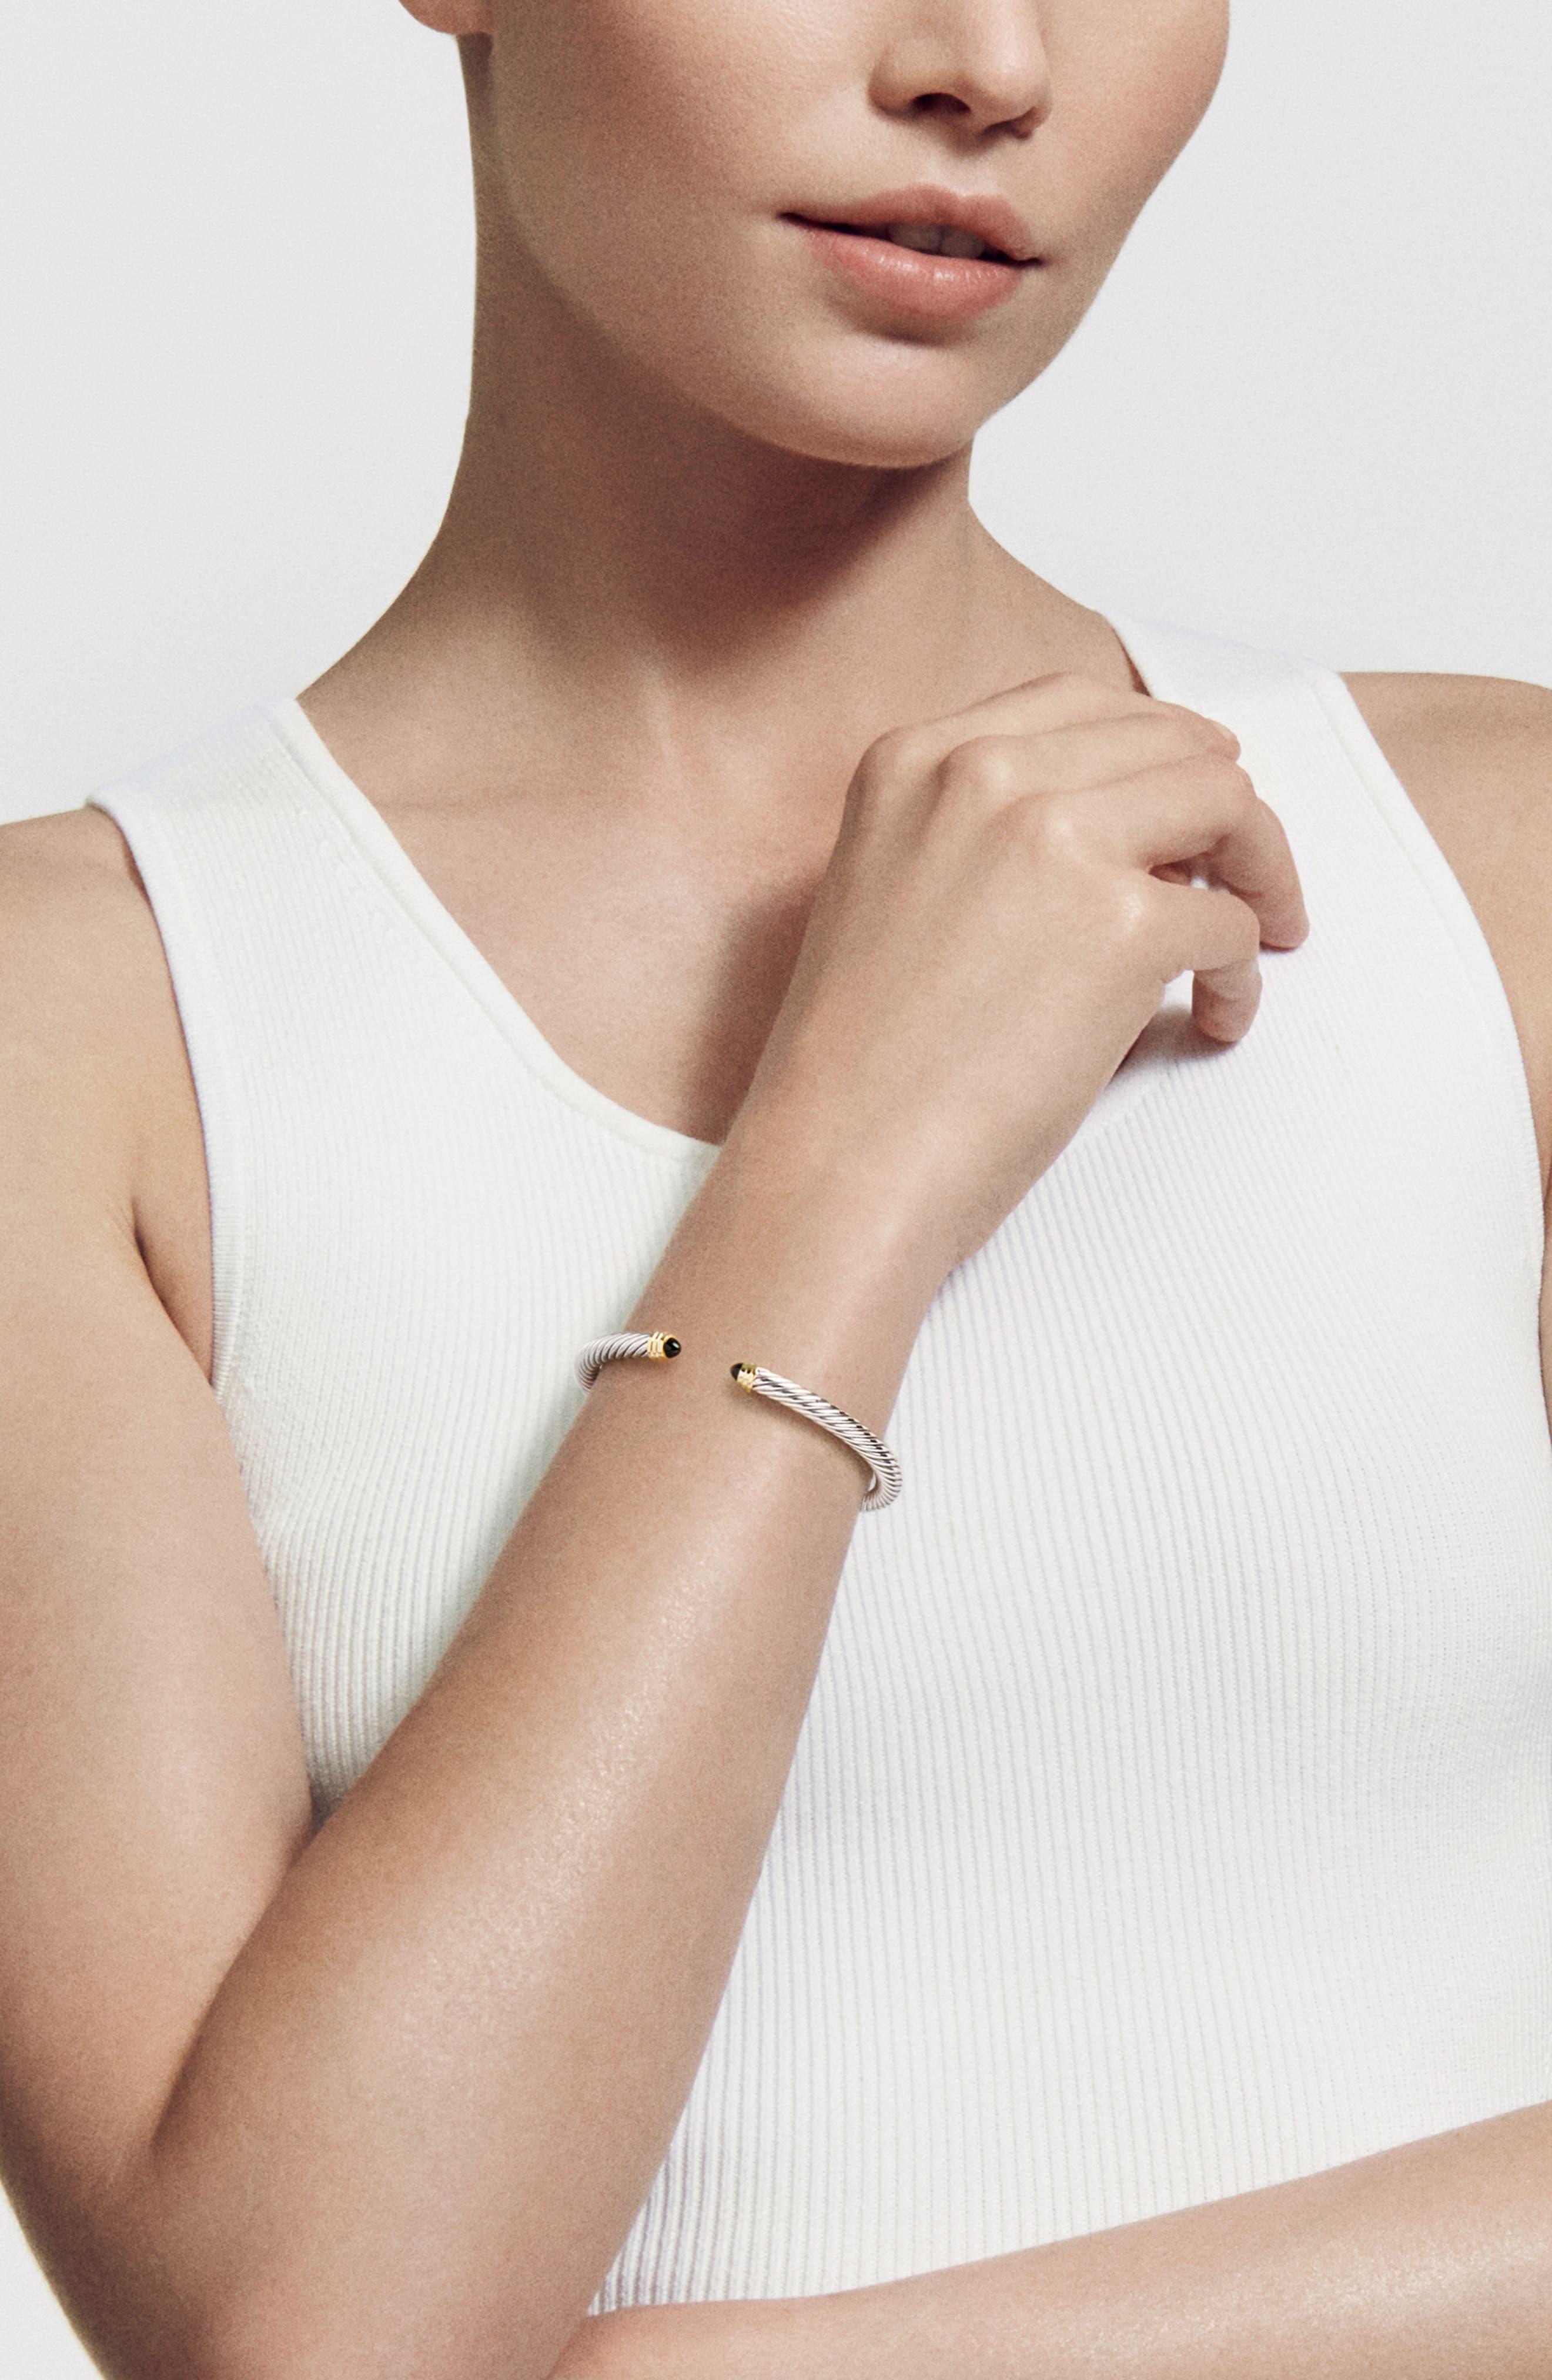 DAVID YURMAN, Cable Classics Bracelet with Semiprecious Stones & 14K Gold, 5mm, Alternate thumbnail 2, color, BLACK ONYX